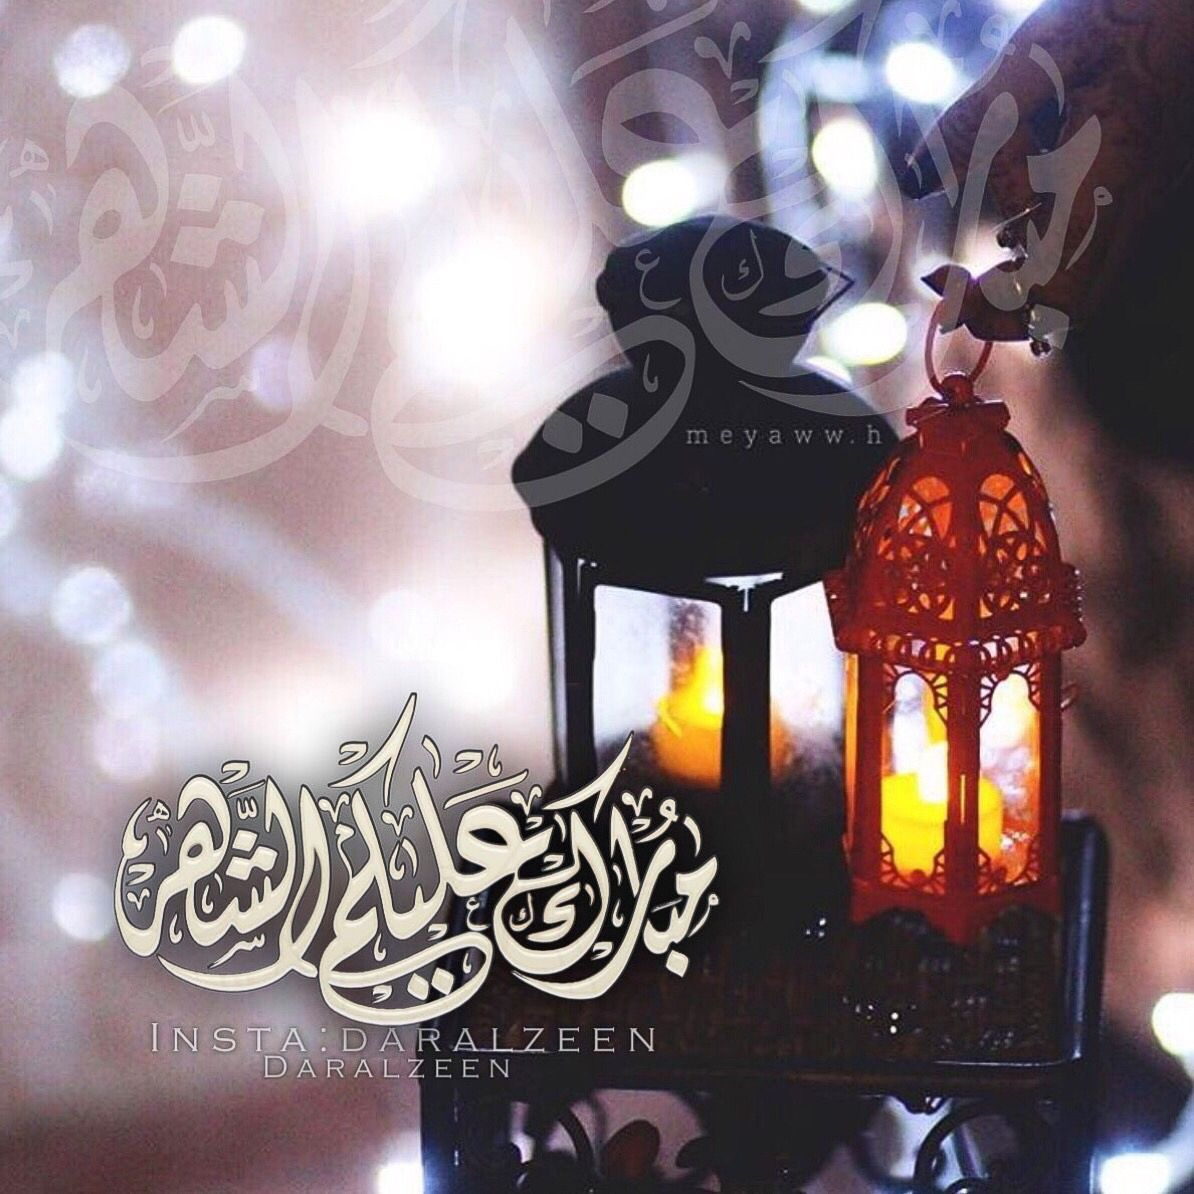 مبارك عليكم الشهر Ramadan Greetings Beautiful Flowers Ramadan Kareem